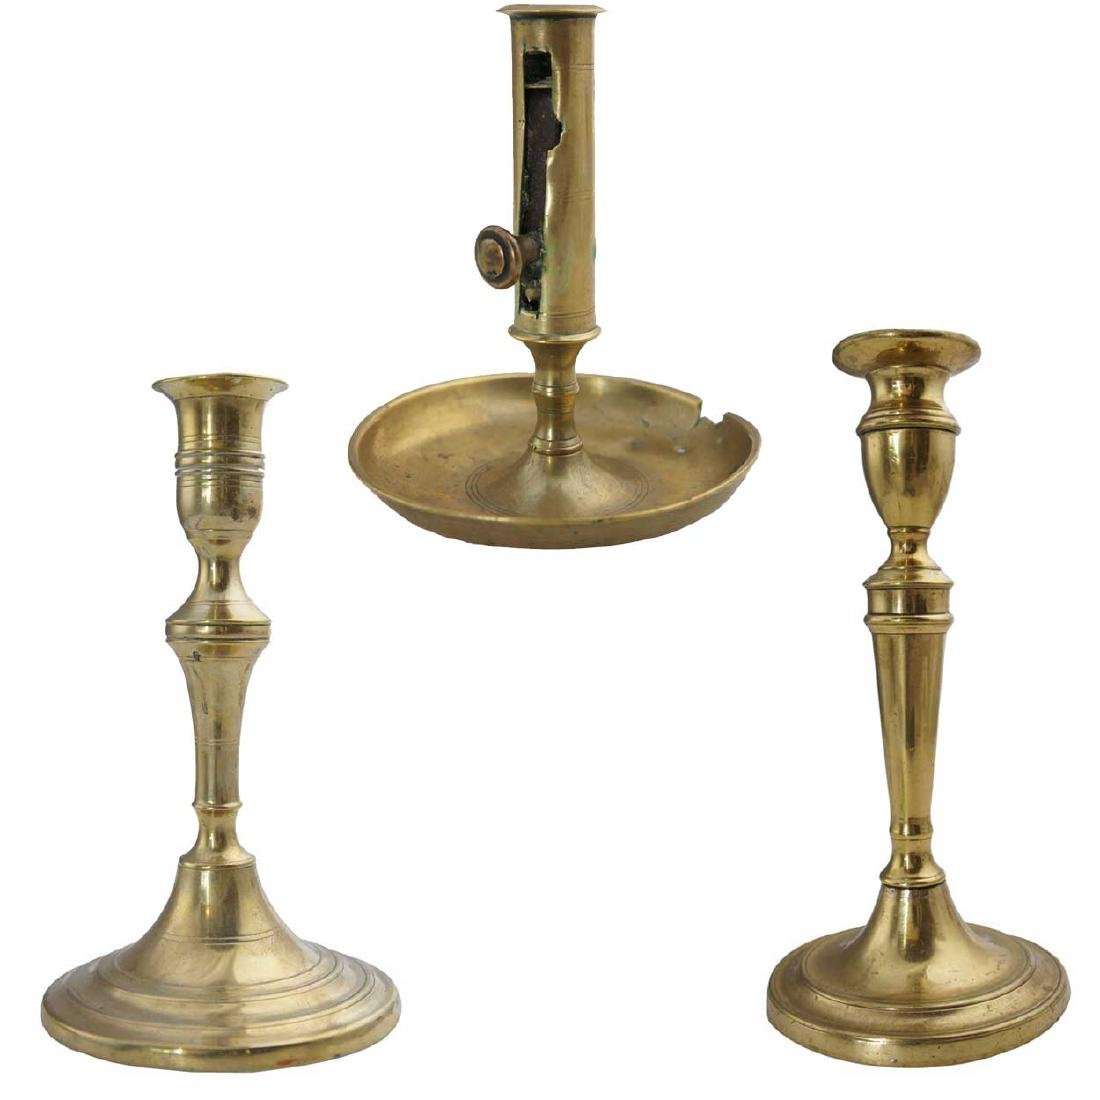 Three Antique Brass Candlesticks